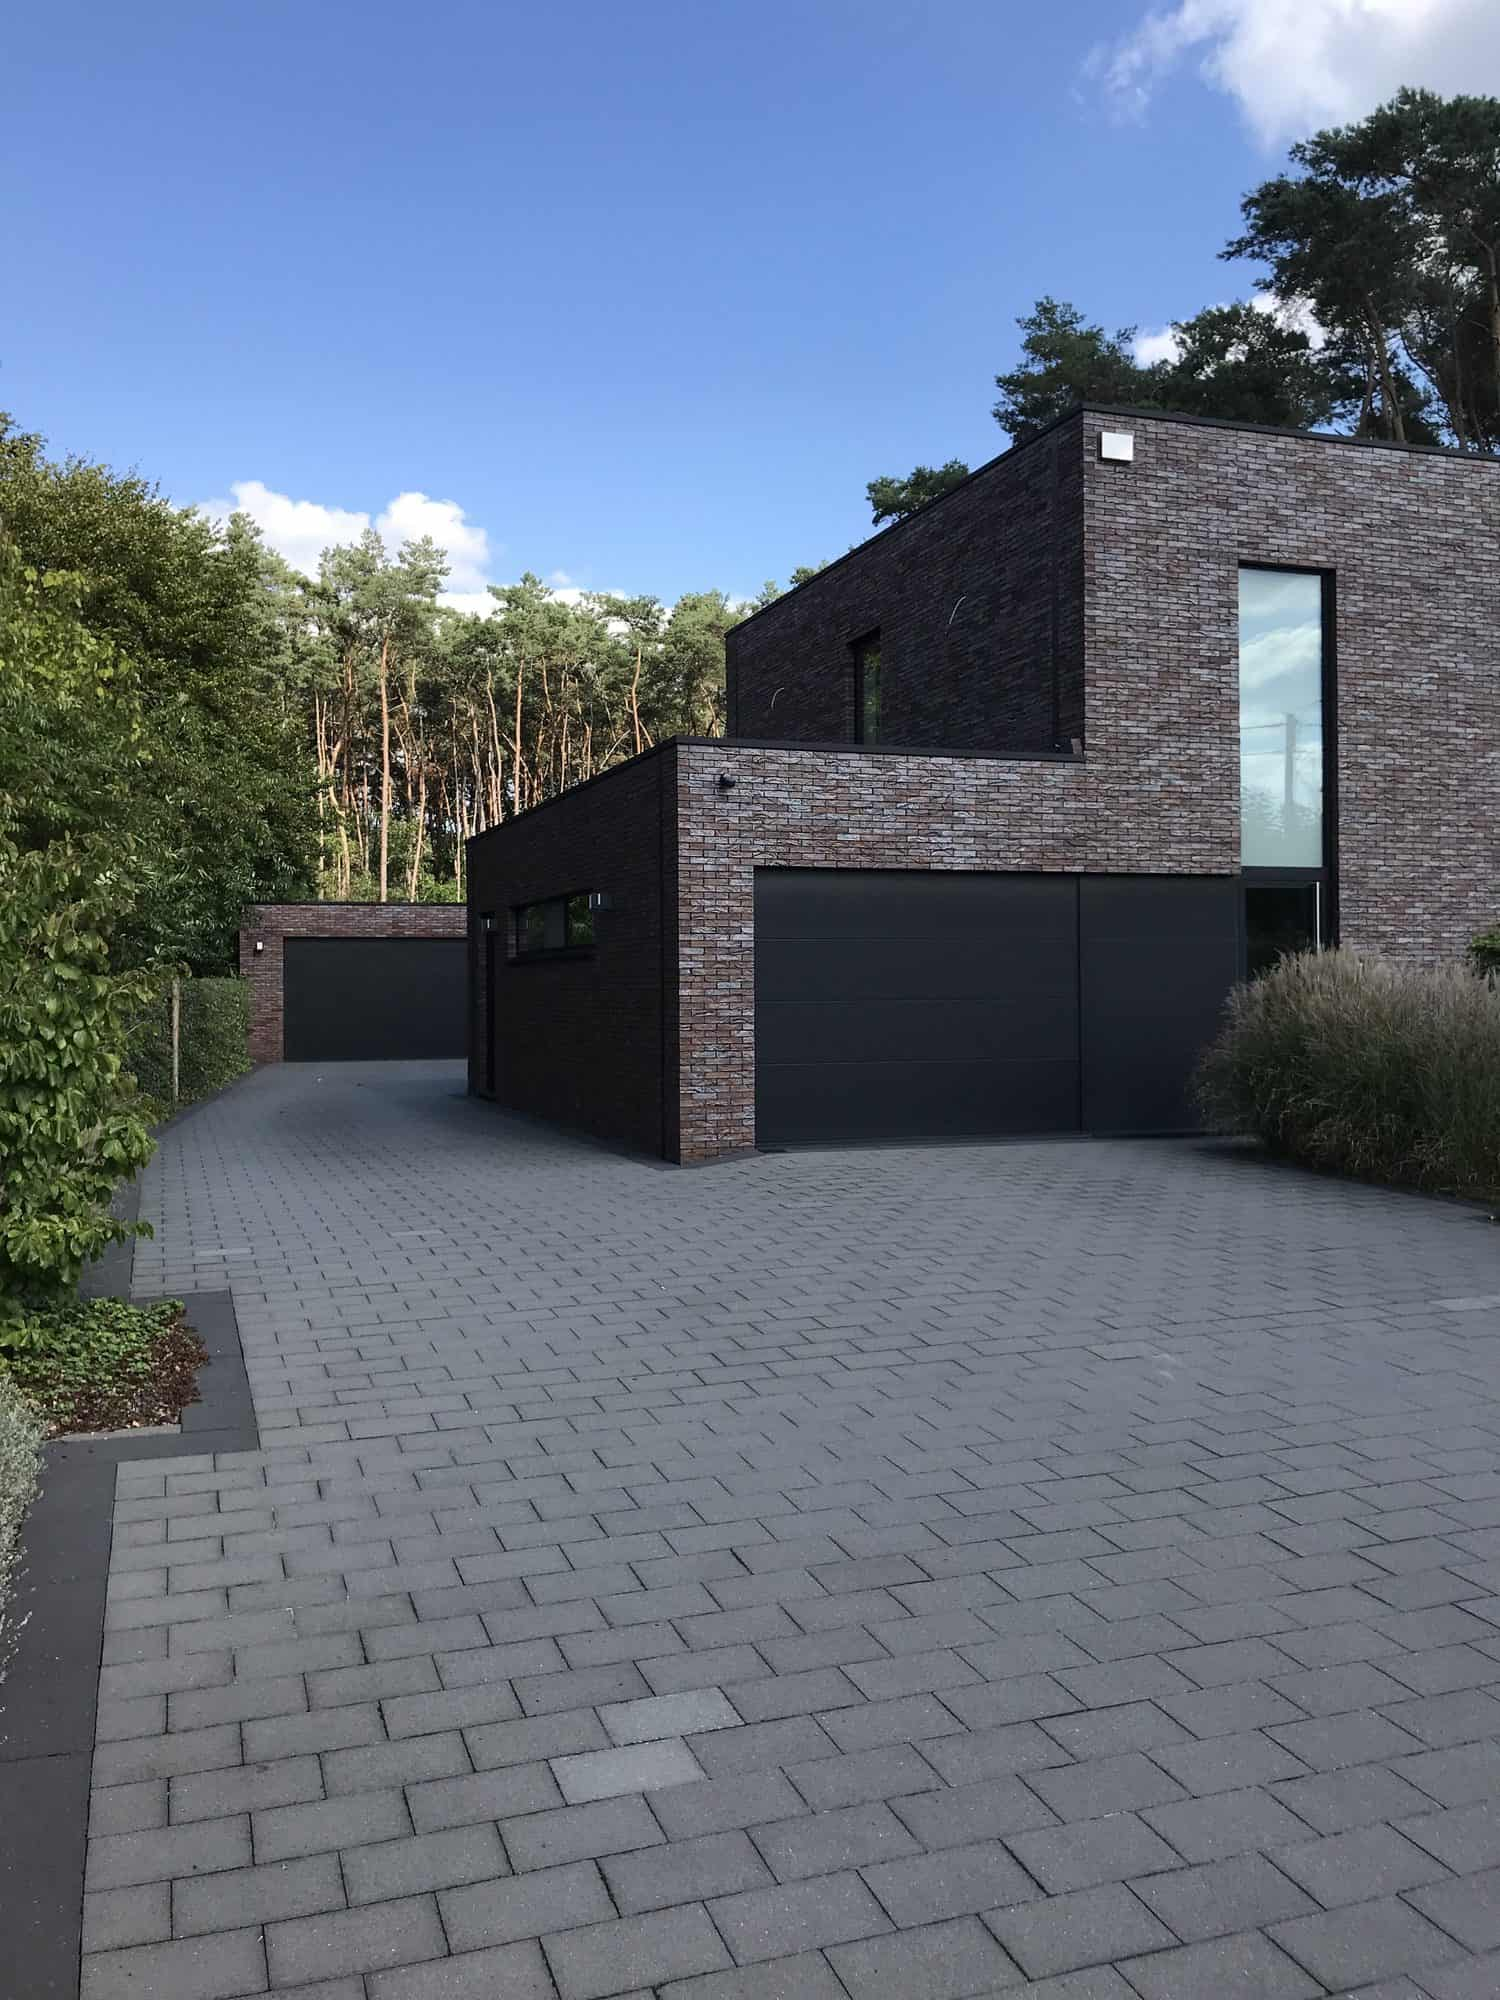 Detail afbeelding 5 van V & M   –   Strakke Woning   –   Zutendaal | Ontwerp door architect Patrick Strackx